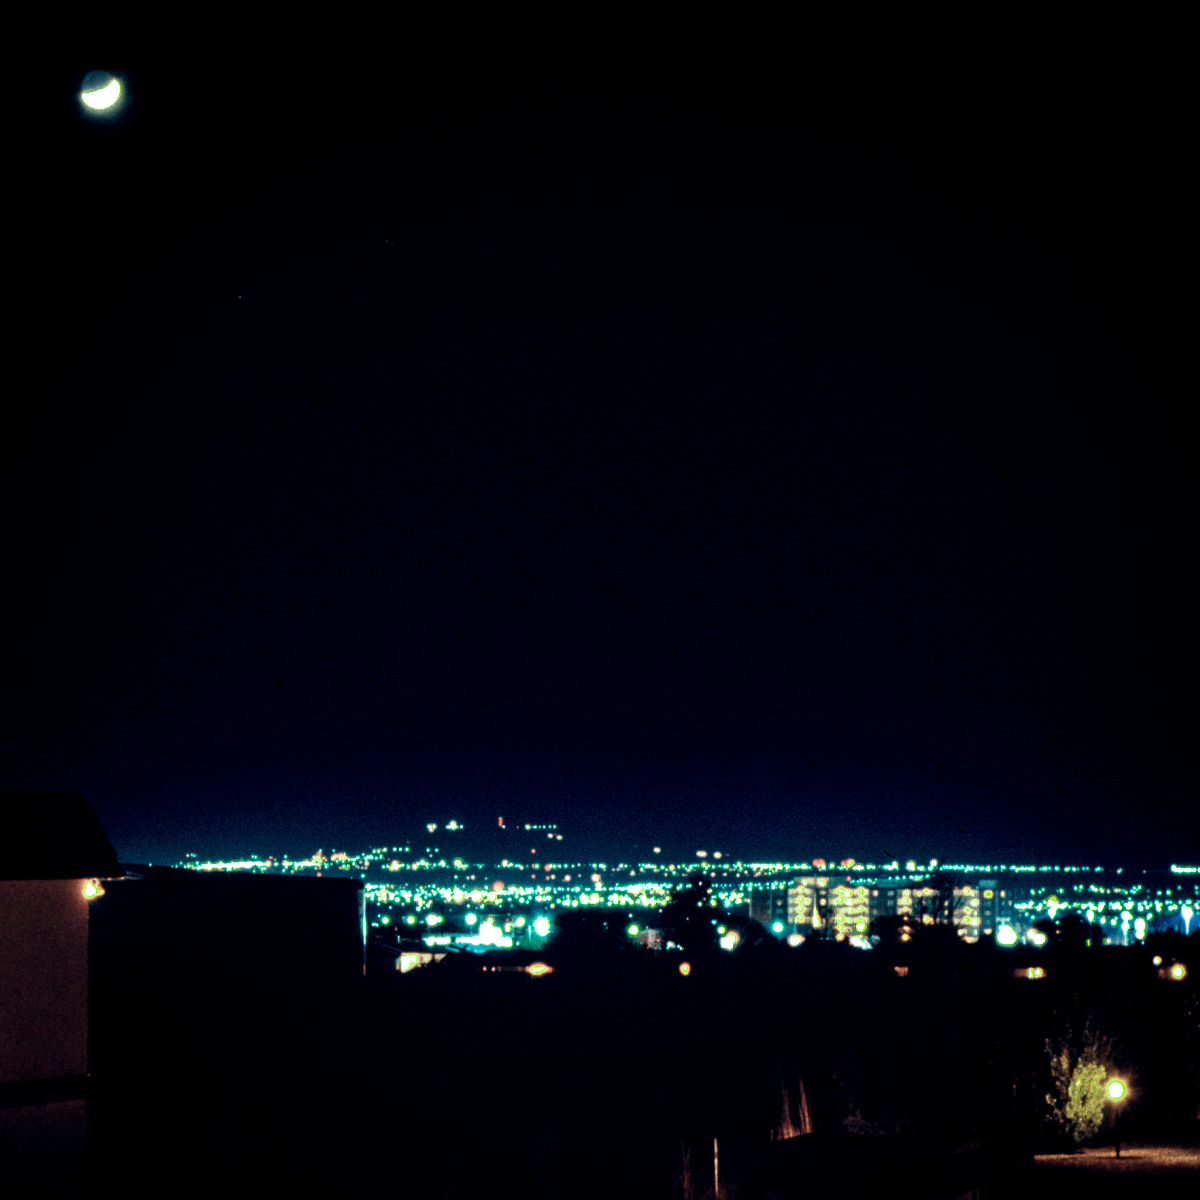 Lunar eclipse? Maybe.